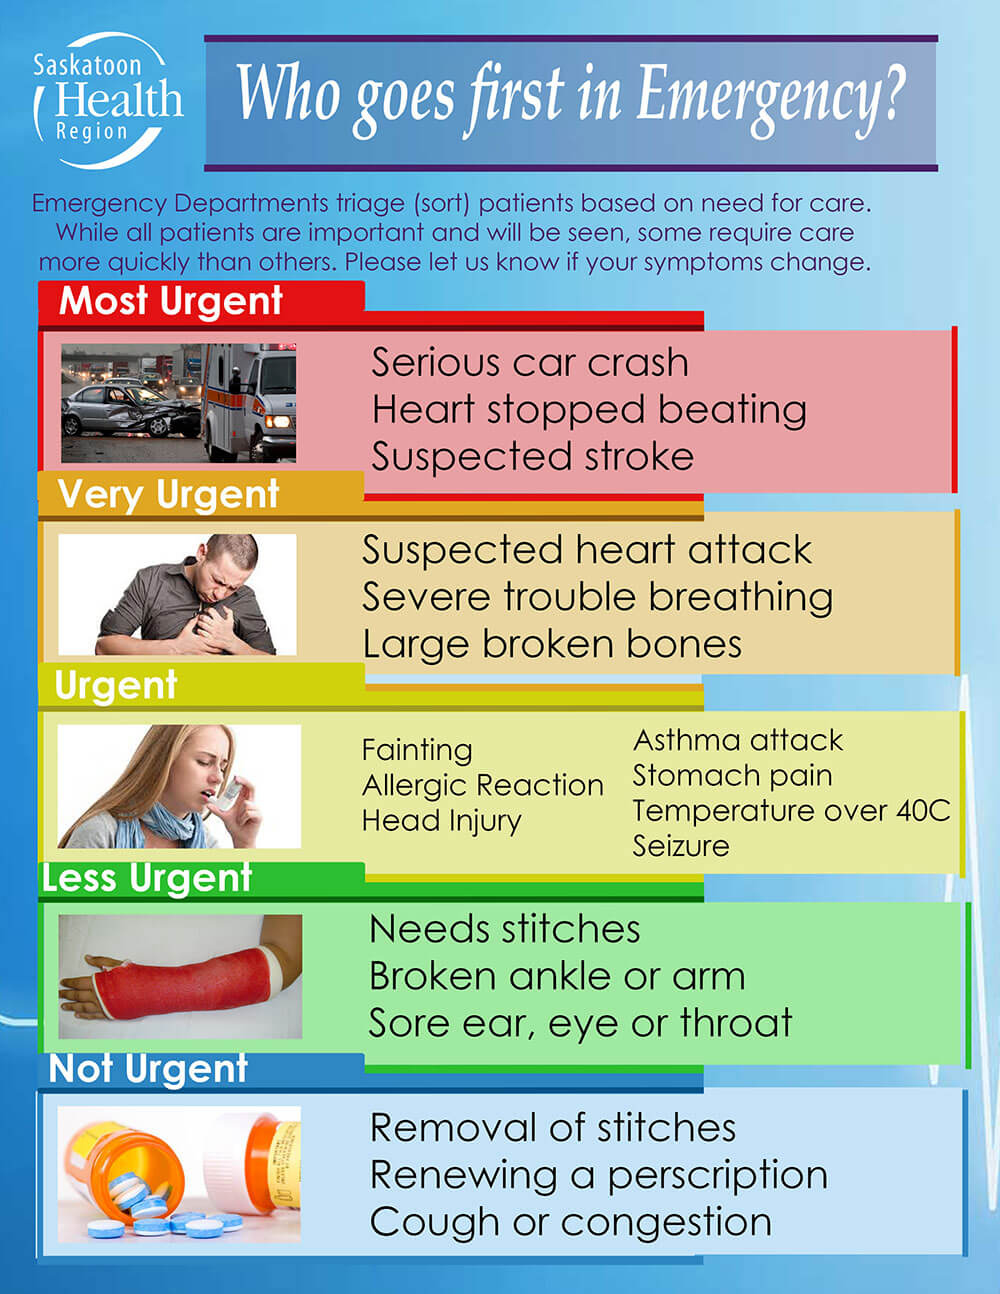 Apply triage